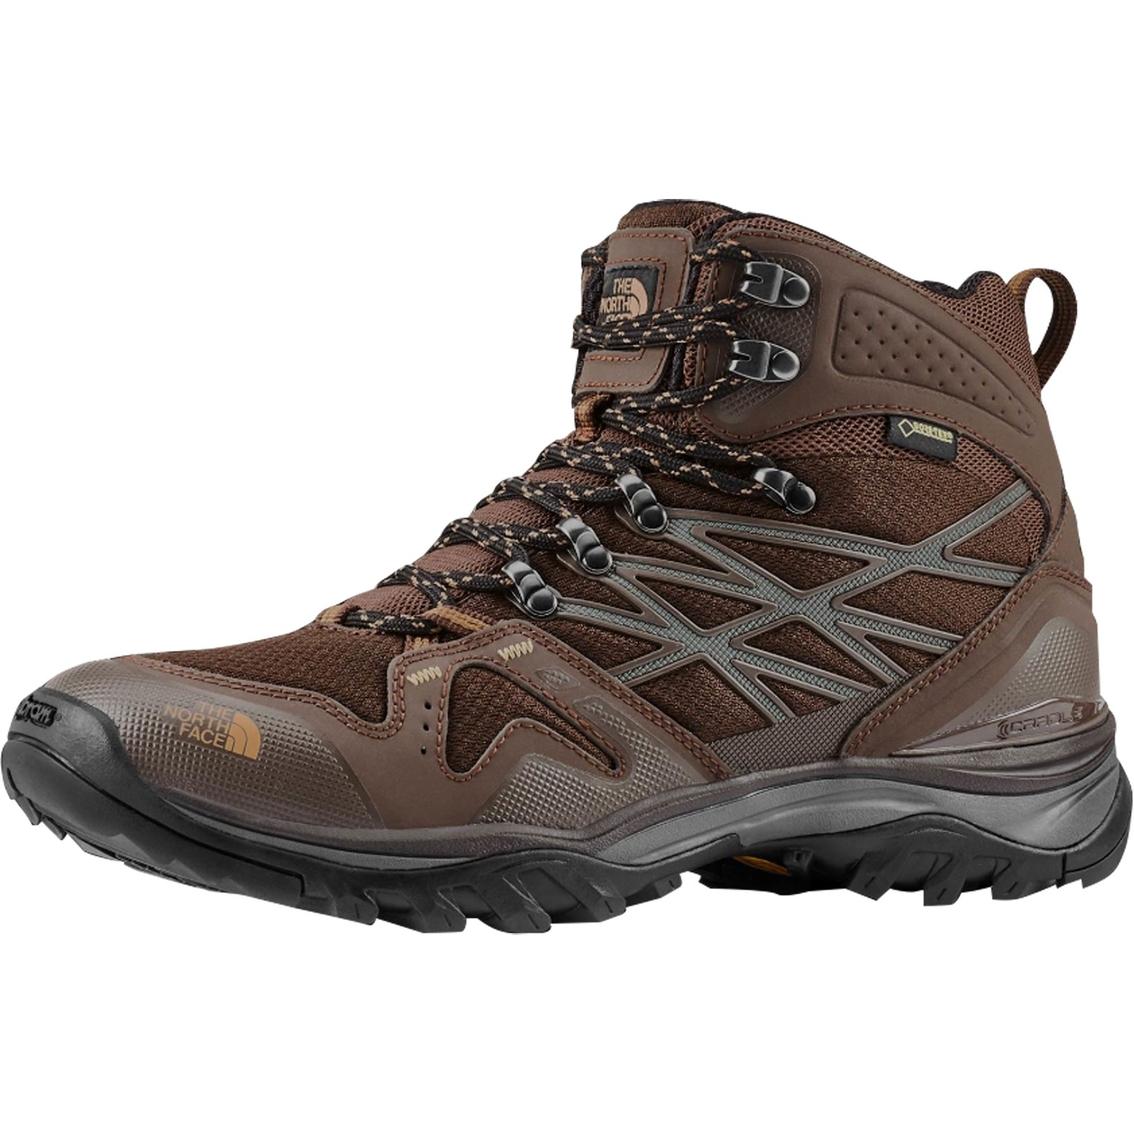 4fe0896a8790 The North Face Men s Hedgehog Fastpack Mid Gtx Hiker Shoes